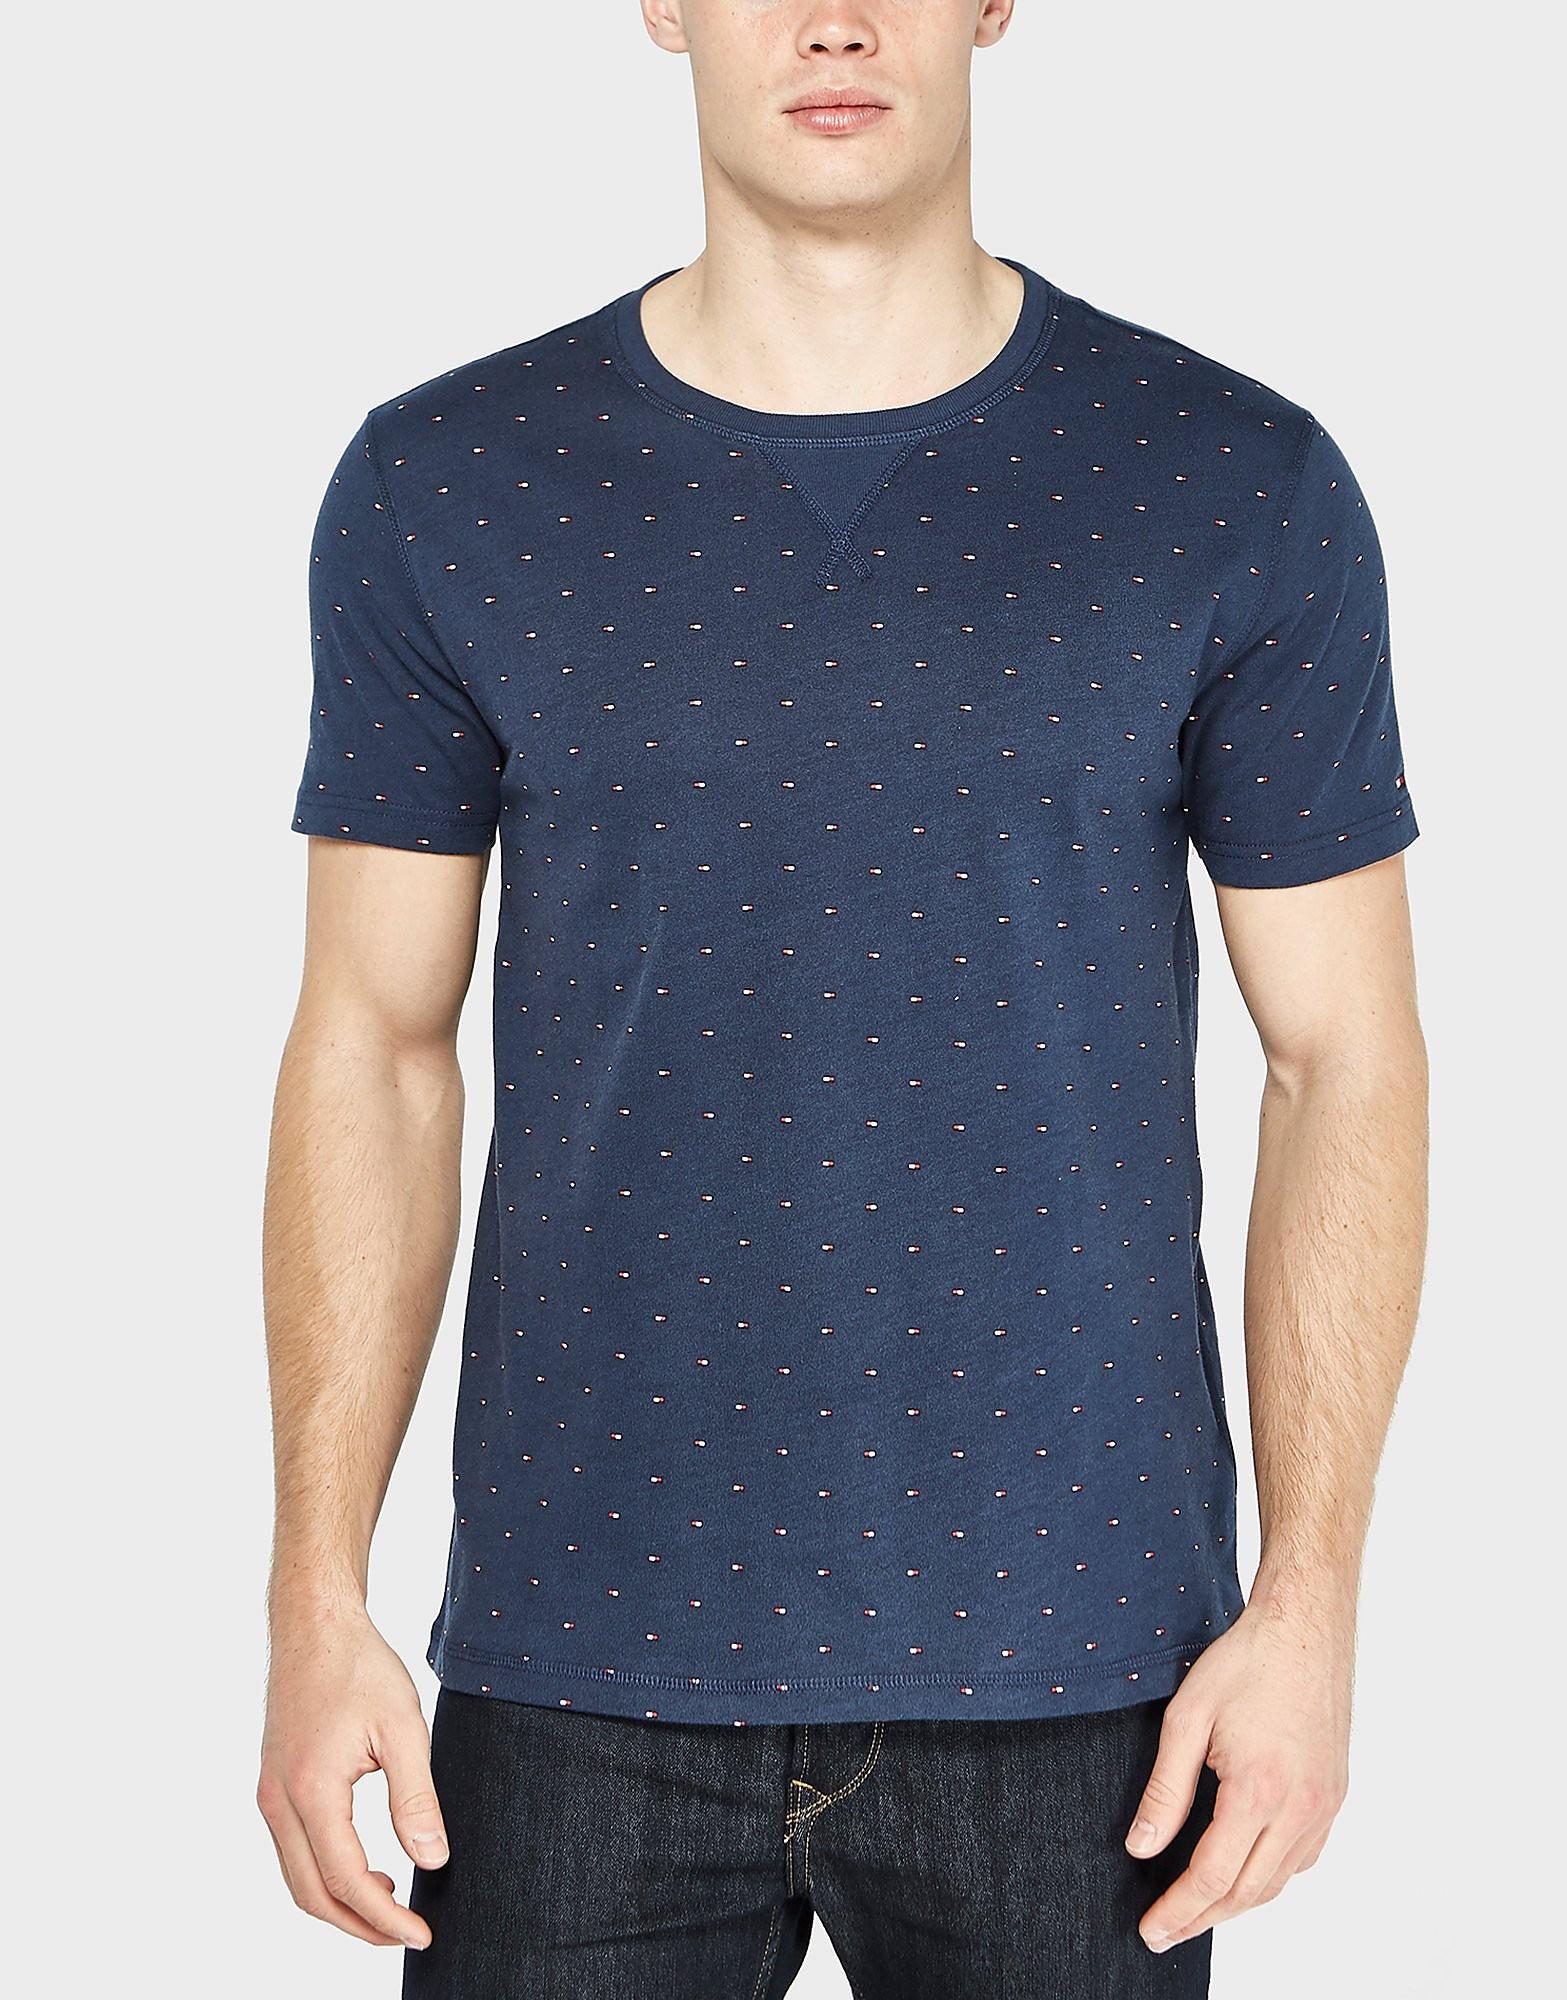 Tommy Hilfiger AO Flag Print T-Shirt